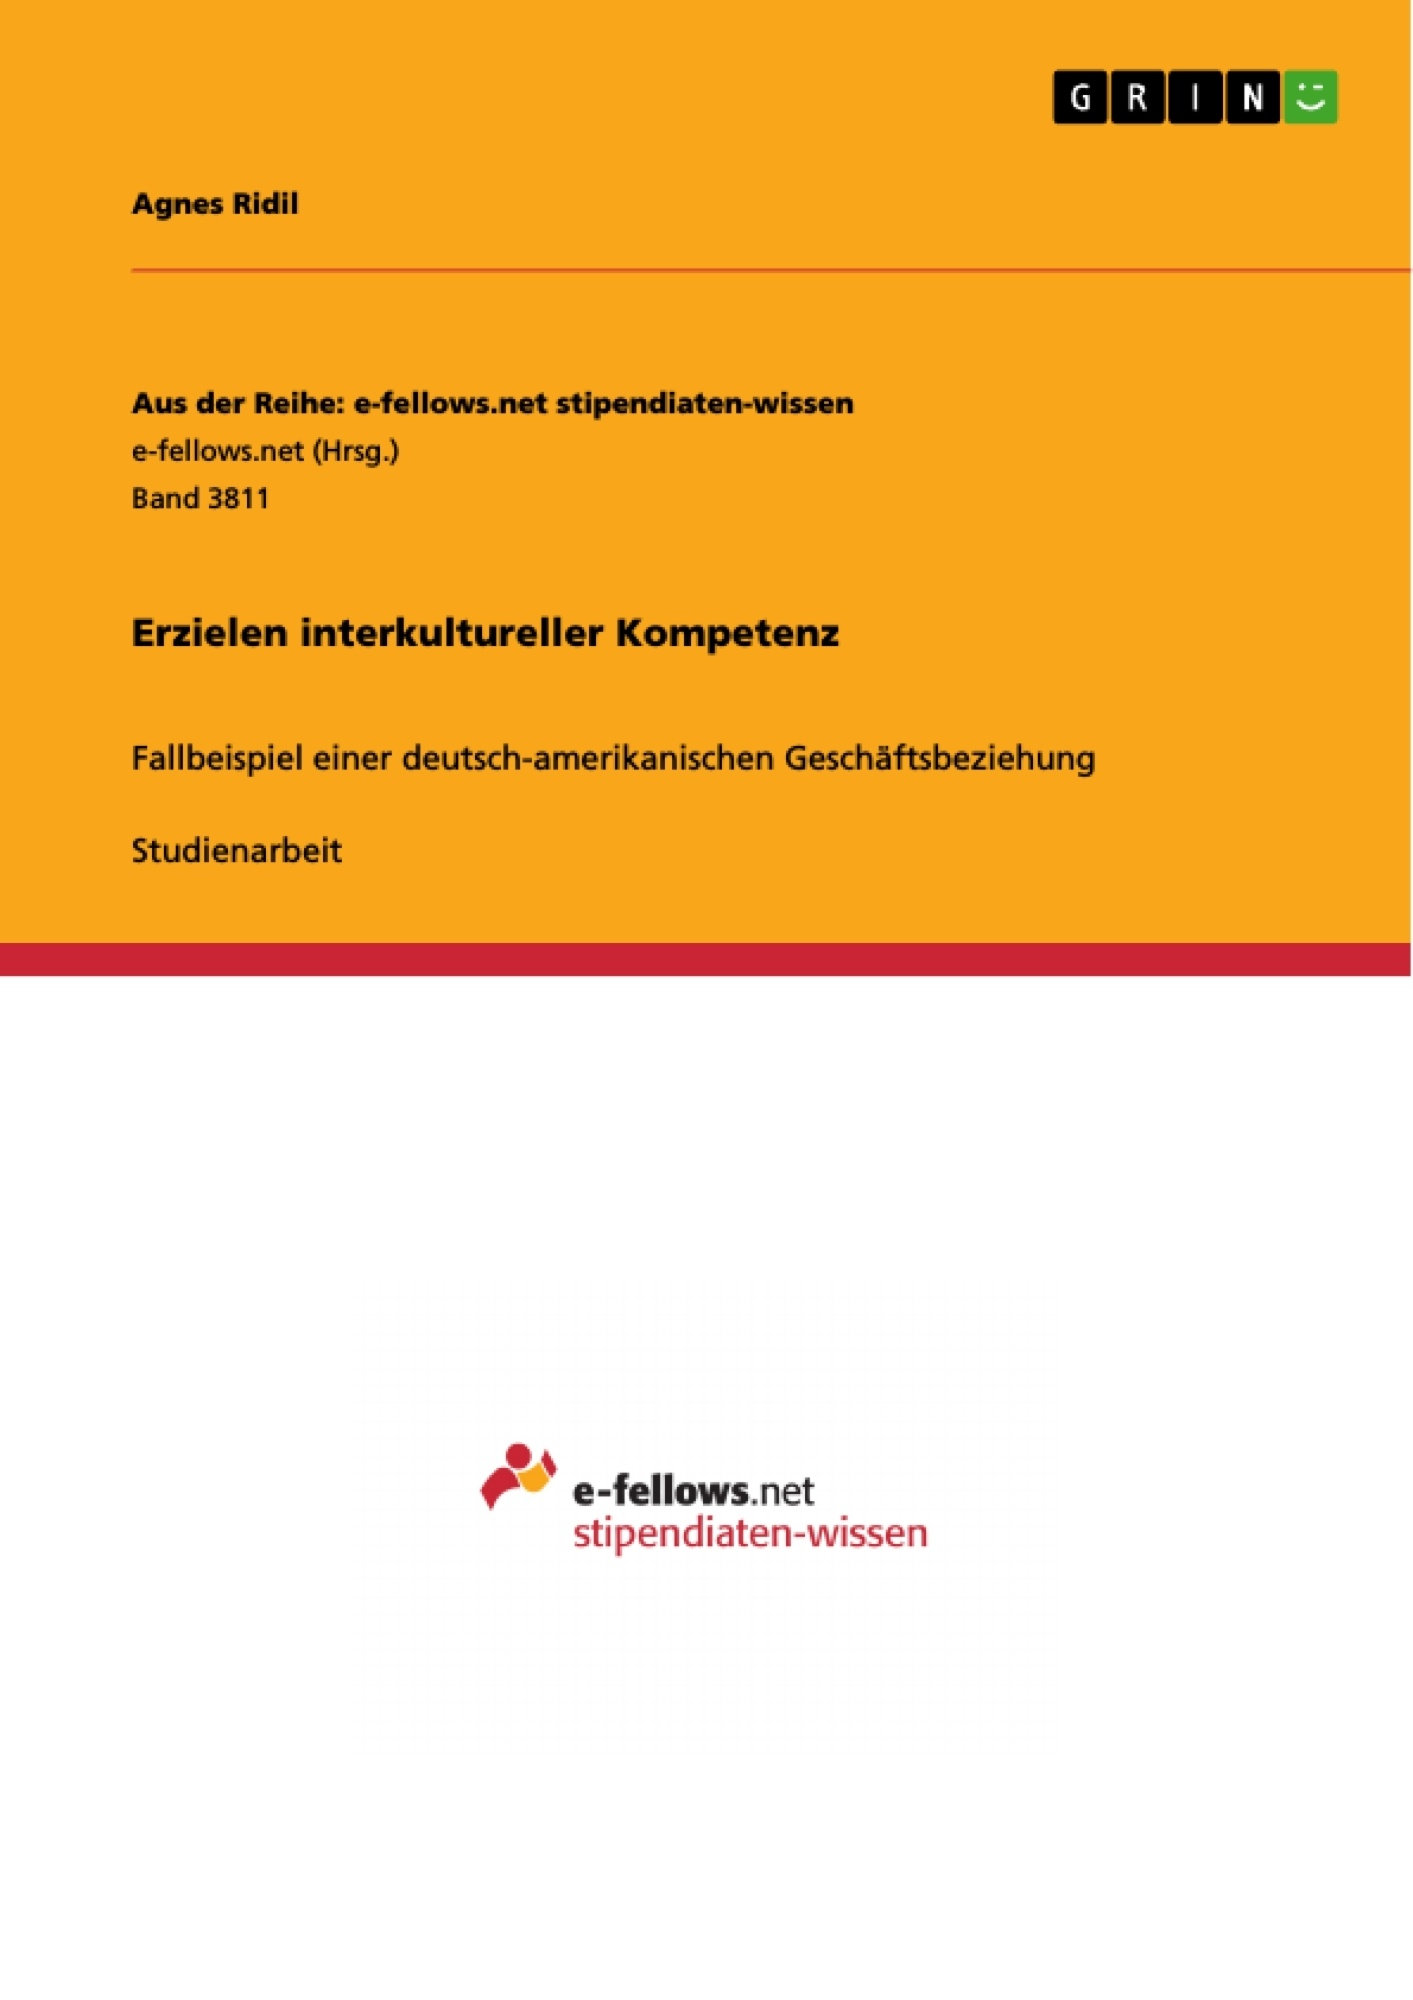 Titel: Erzielen interkultureller Kompetenz